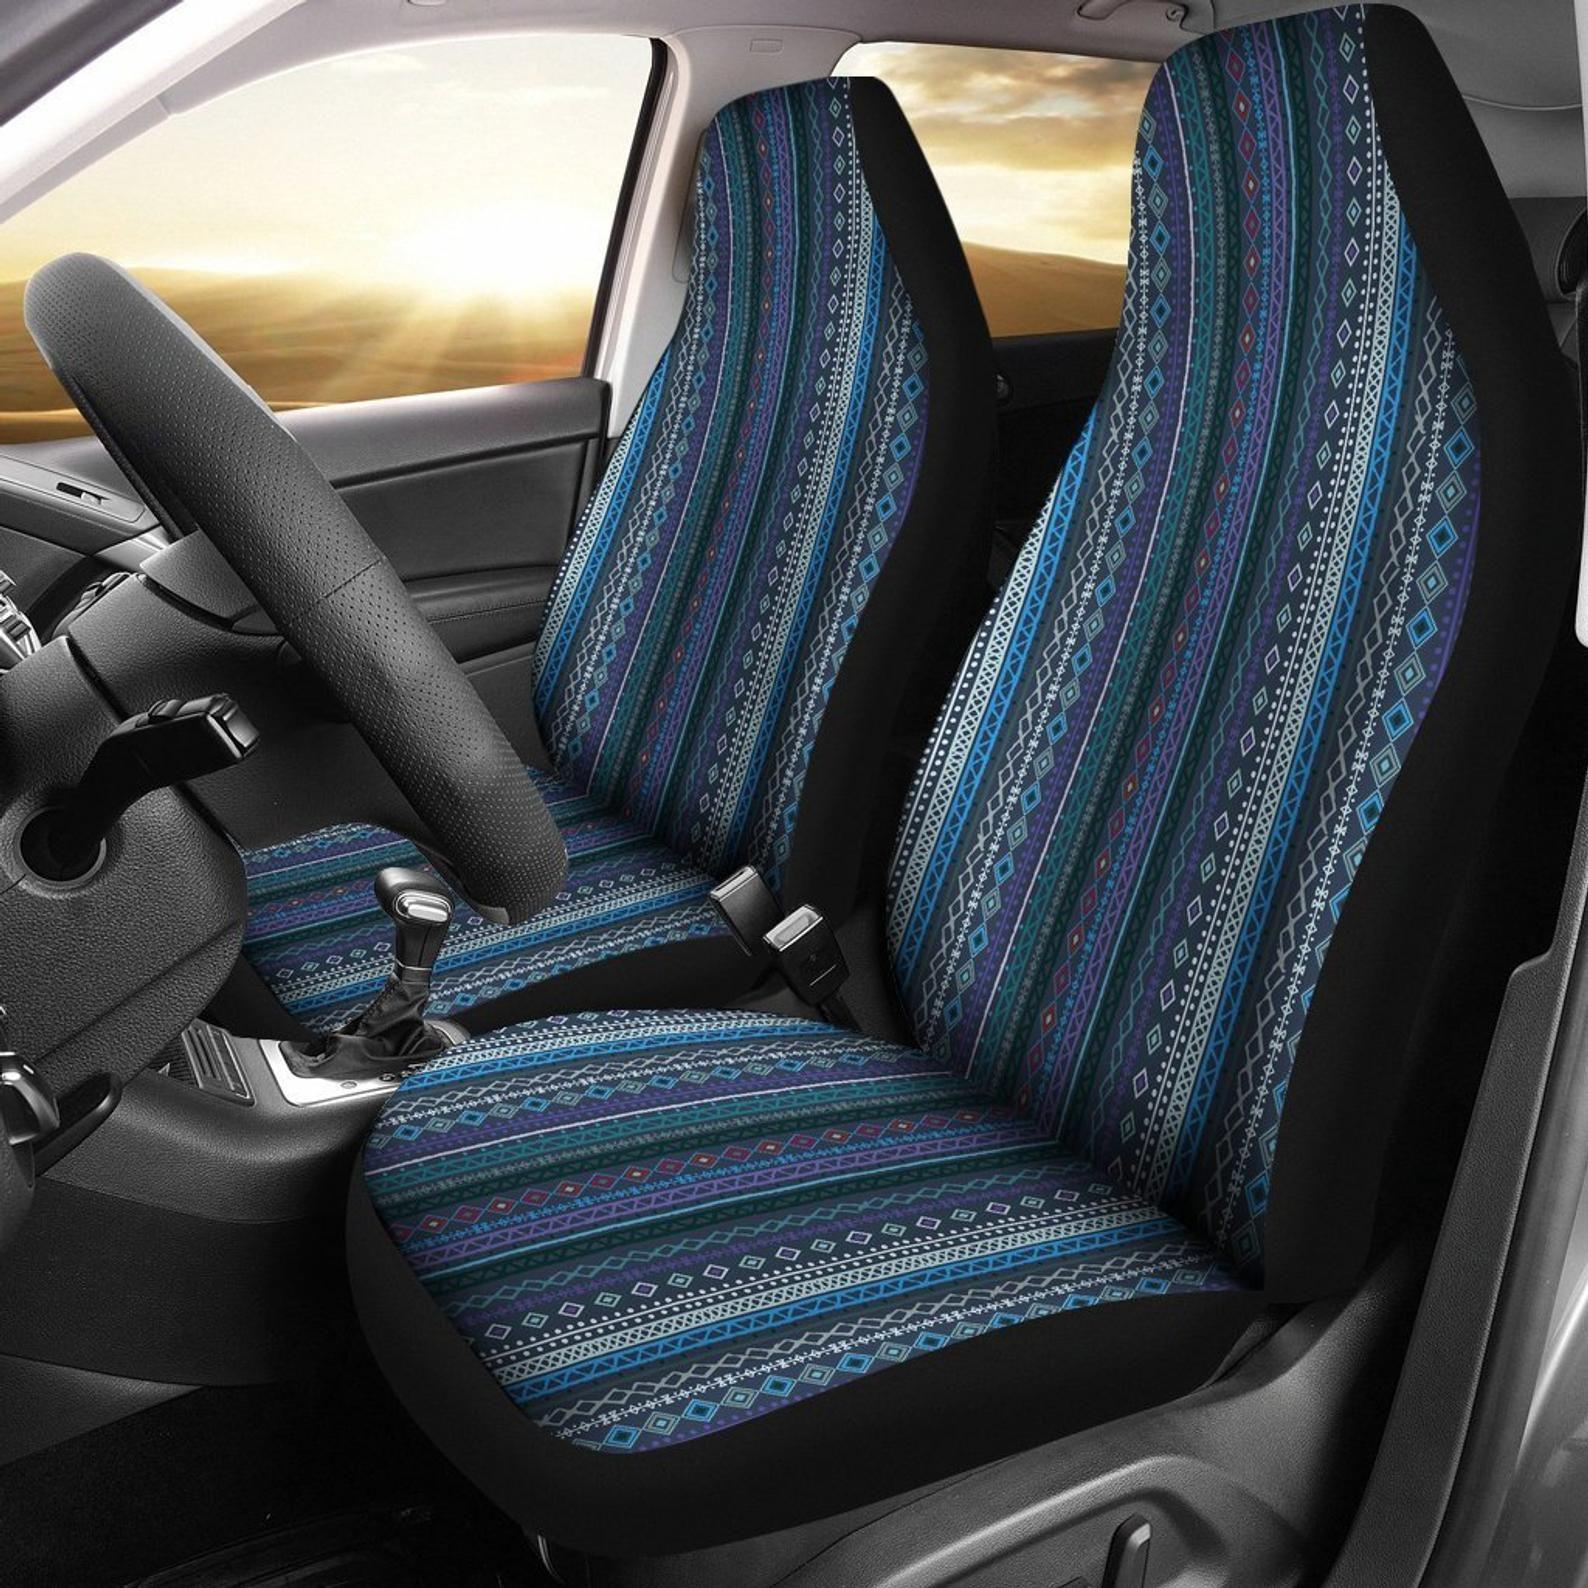 Blue Boho Stripe Decor Car Seat Covers Pair 2 Front Seat | Etsy